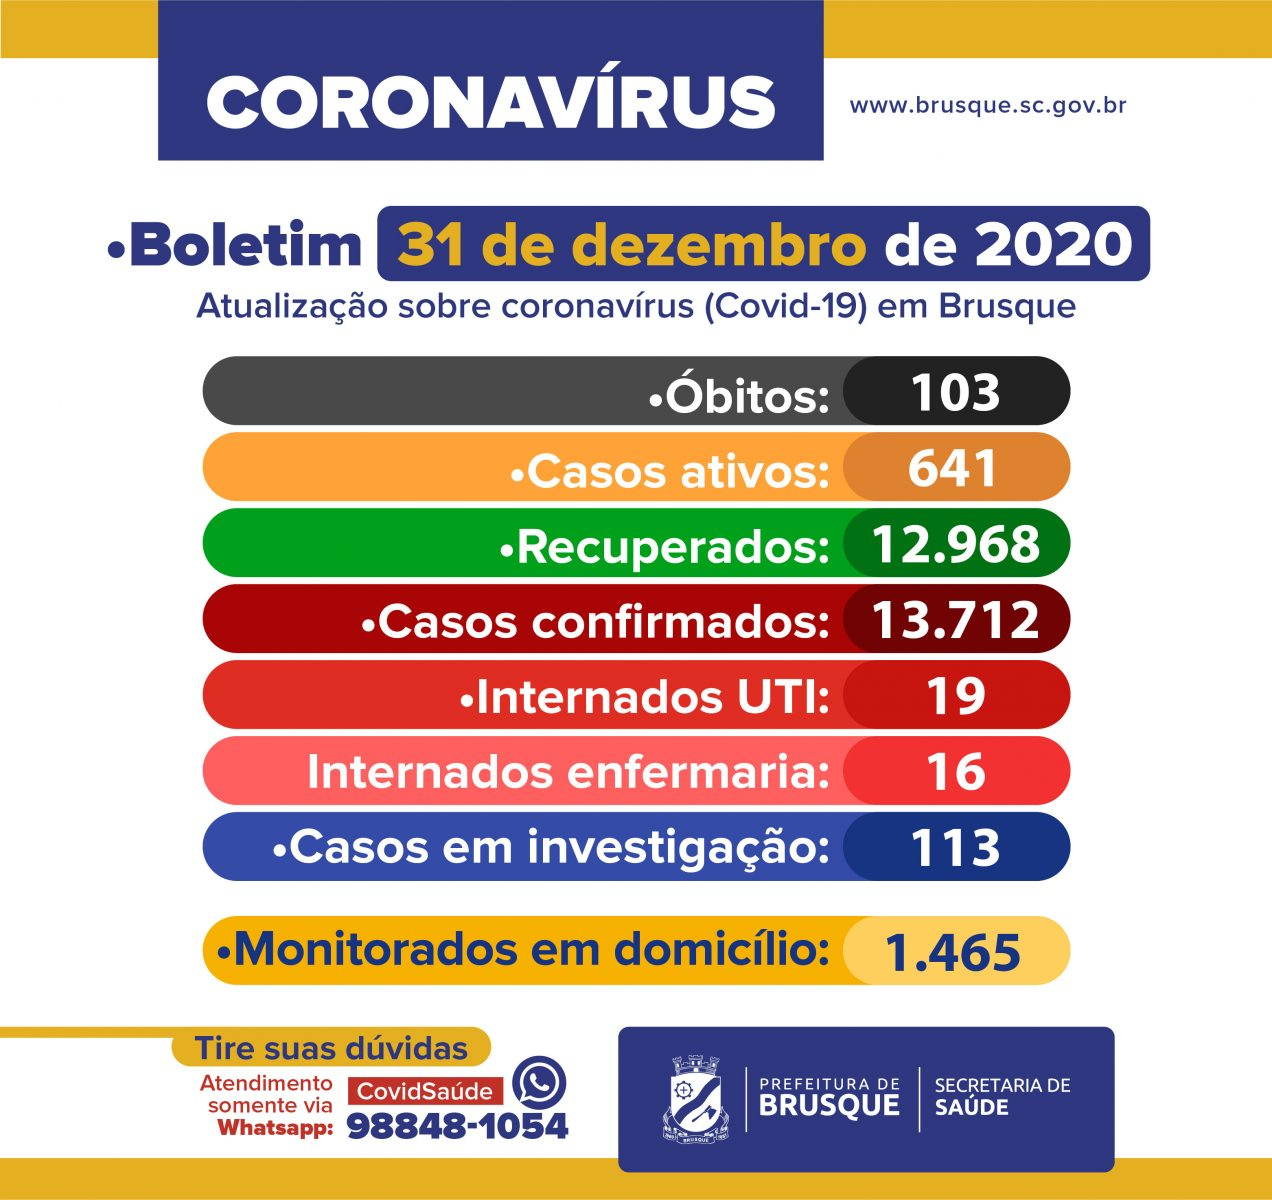 Covid-19: Confira o boletim epidemiológico desta quinta-feira (31)